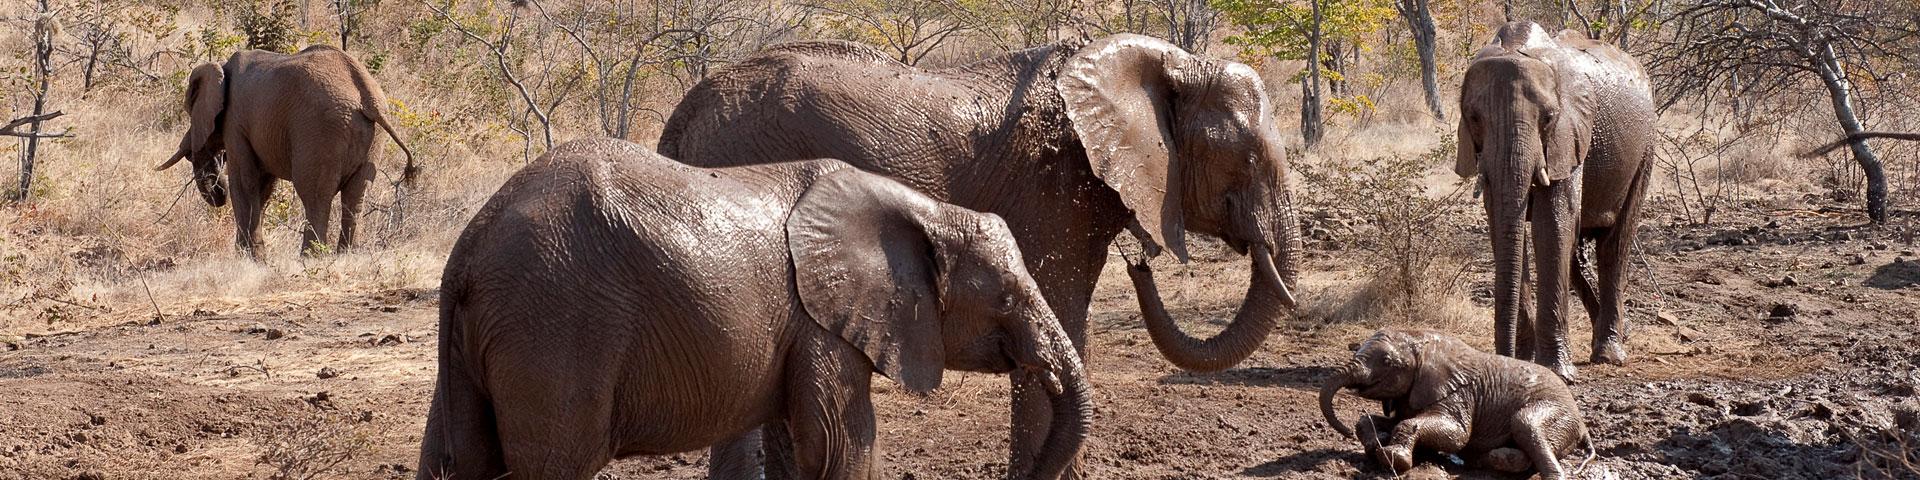 elephant-hp-2